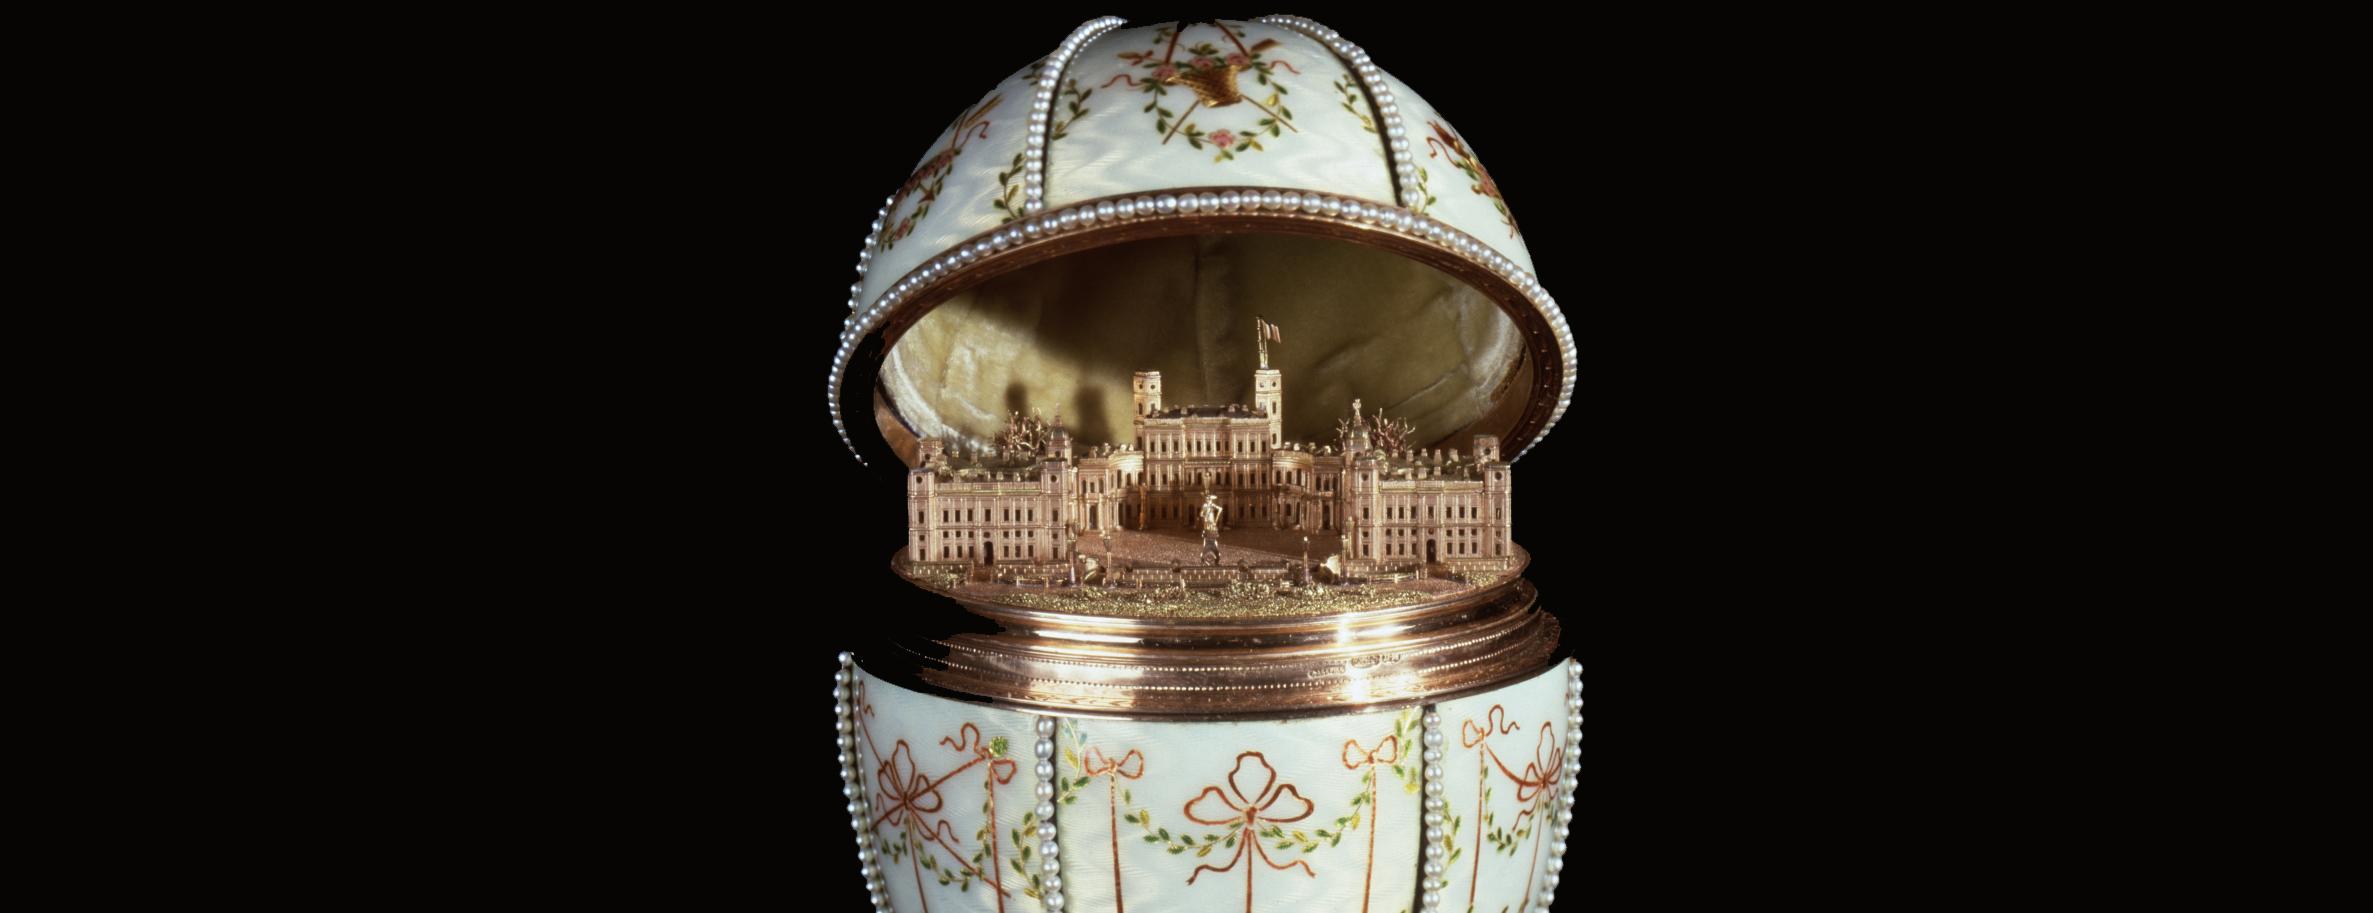 Fabergé Gatchina Palace egg